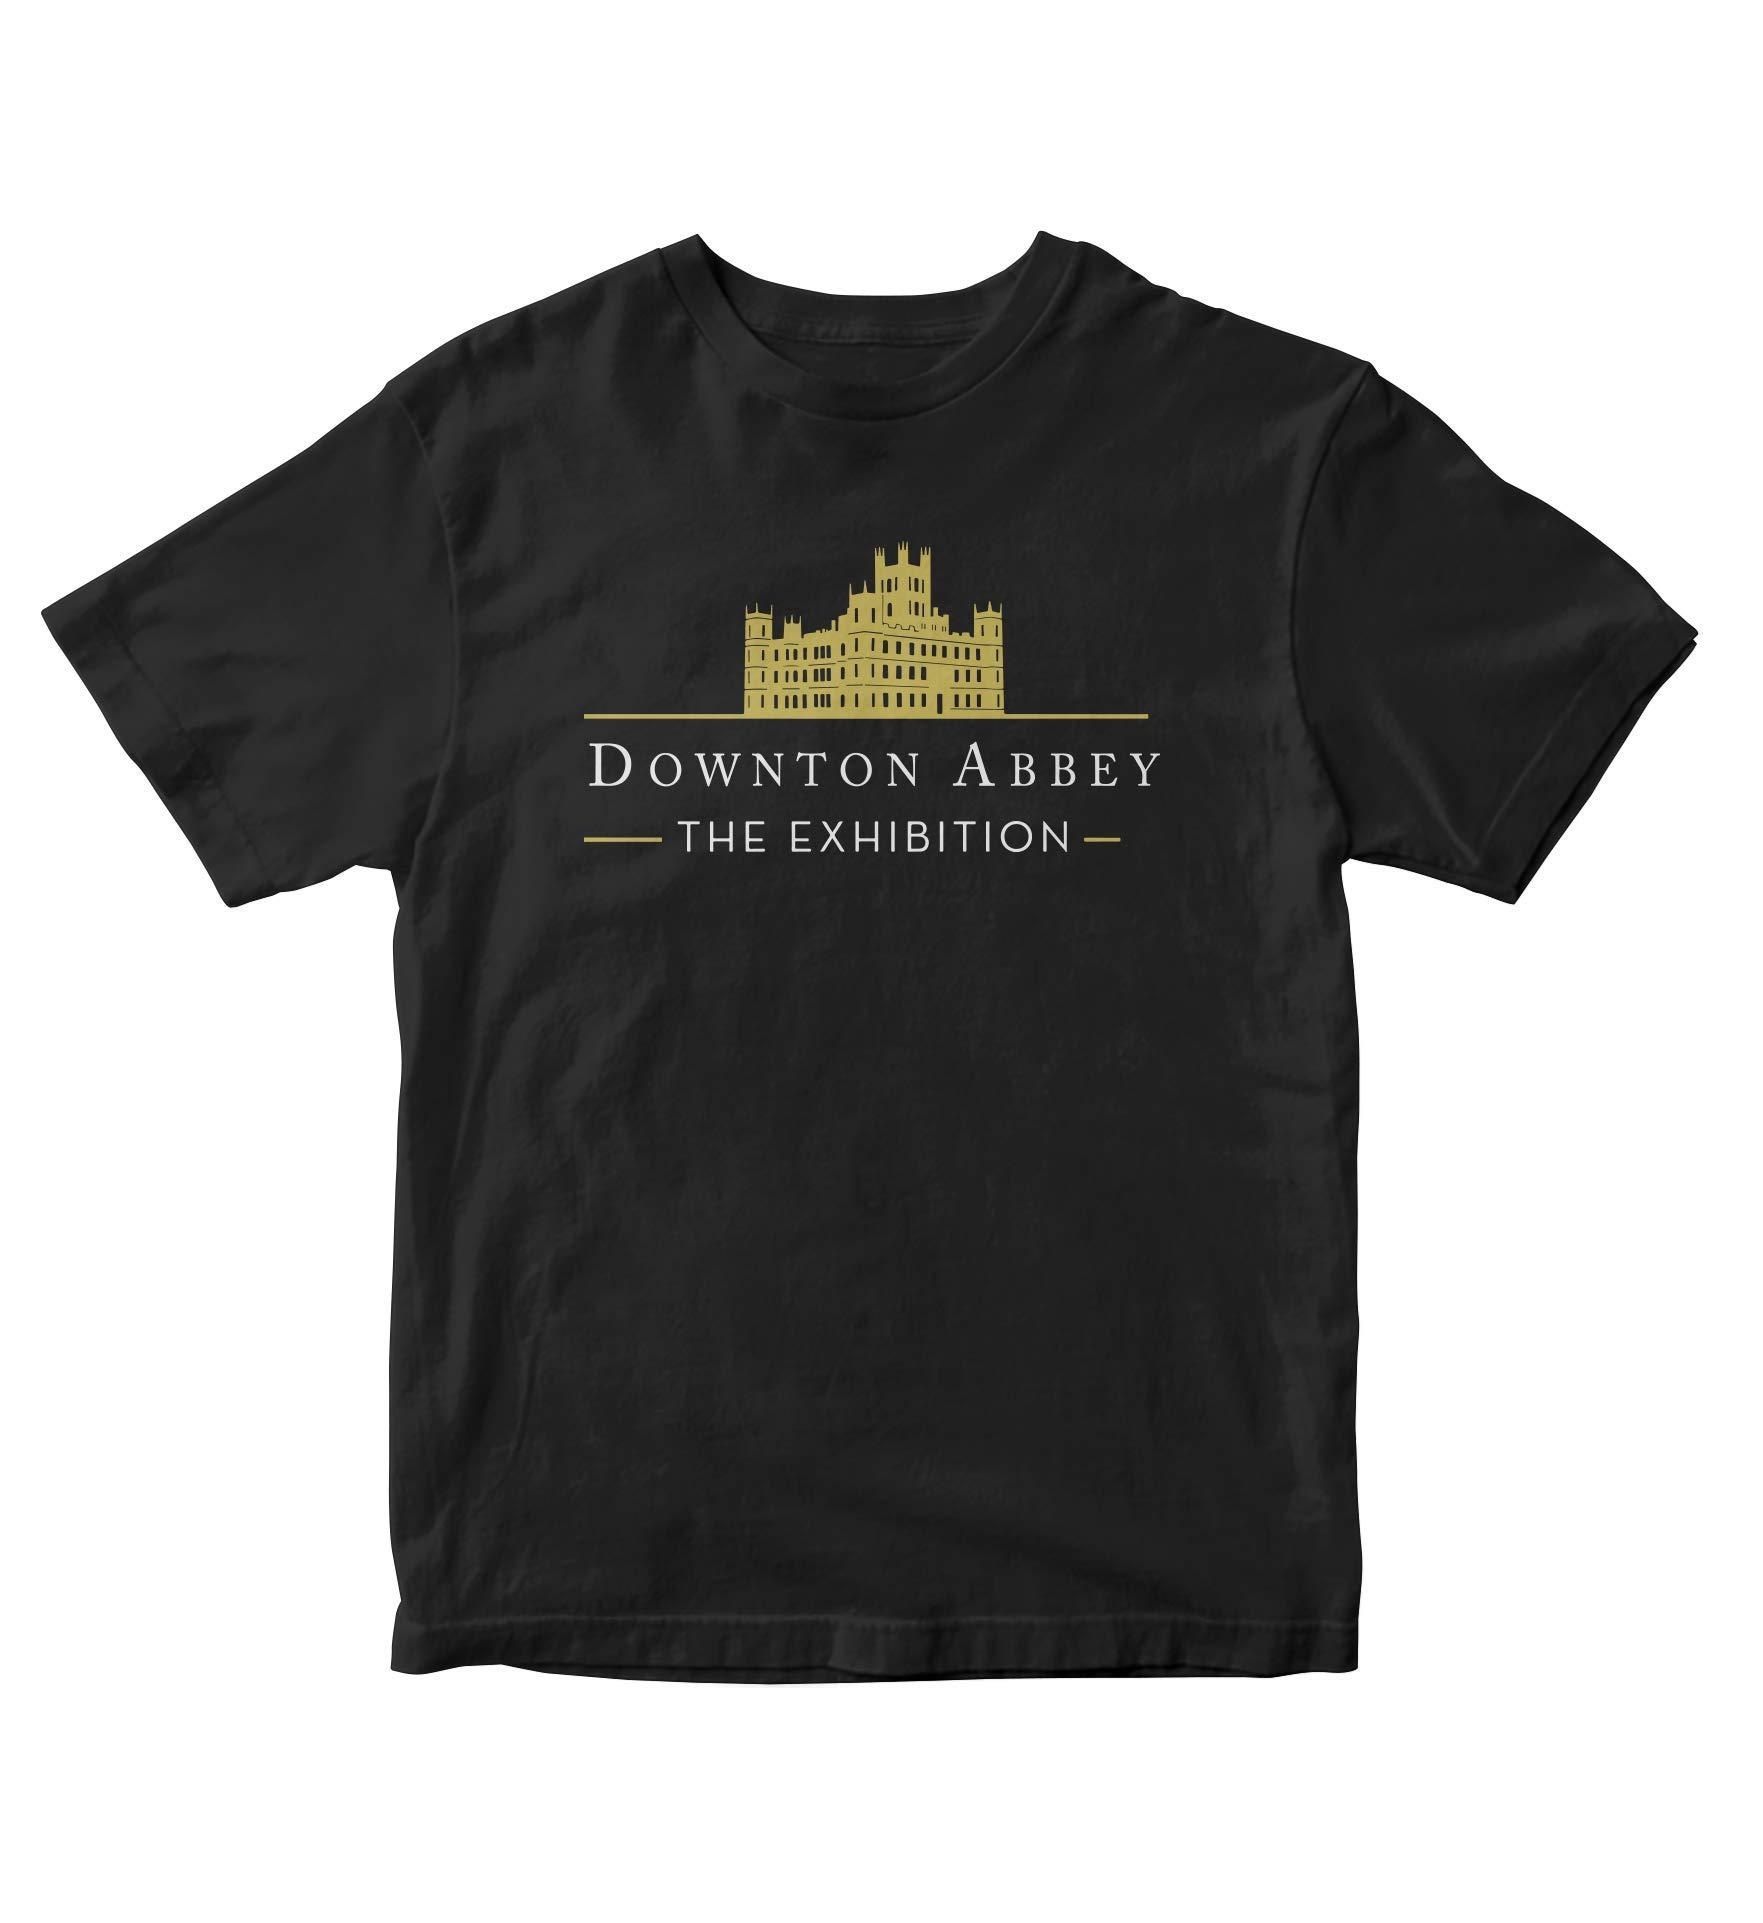 Tjsports Downton Abbey The Exhibition Black Shirt S Tv Show M172